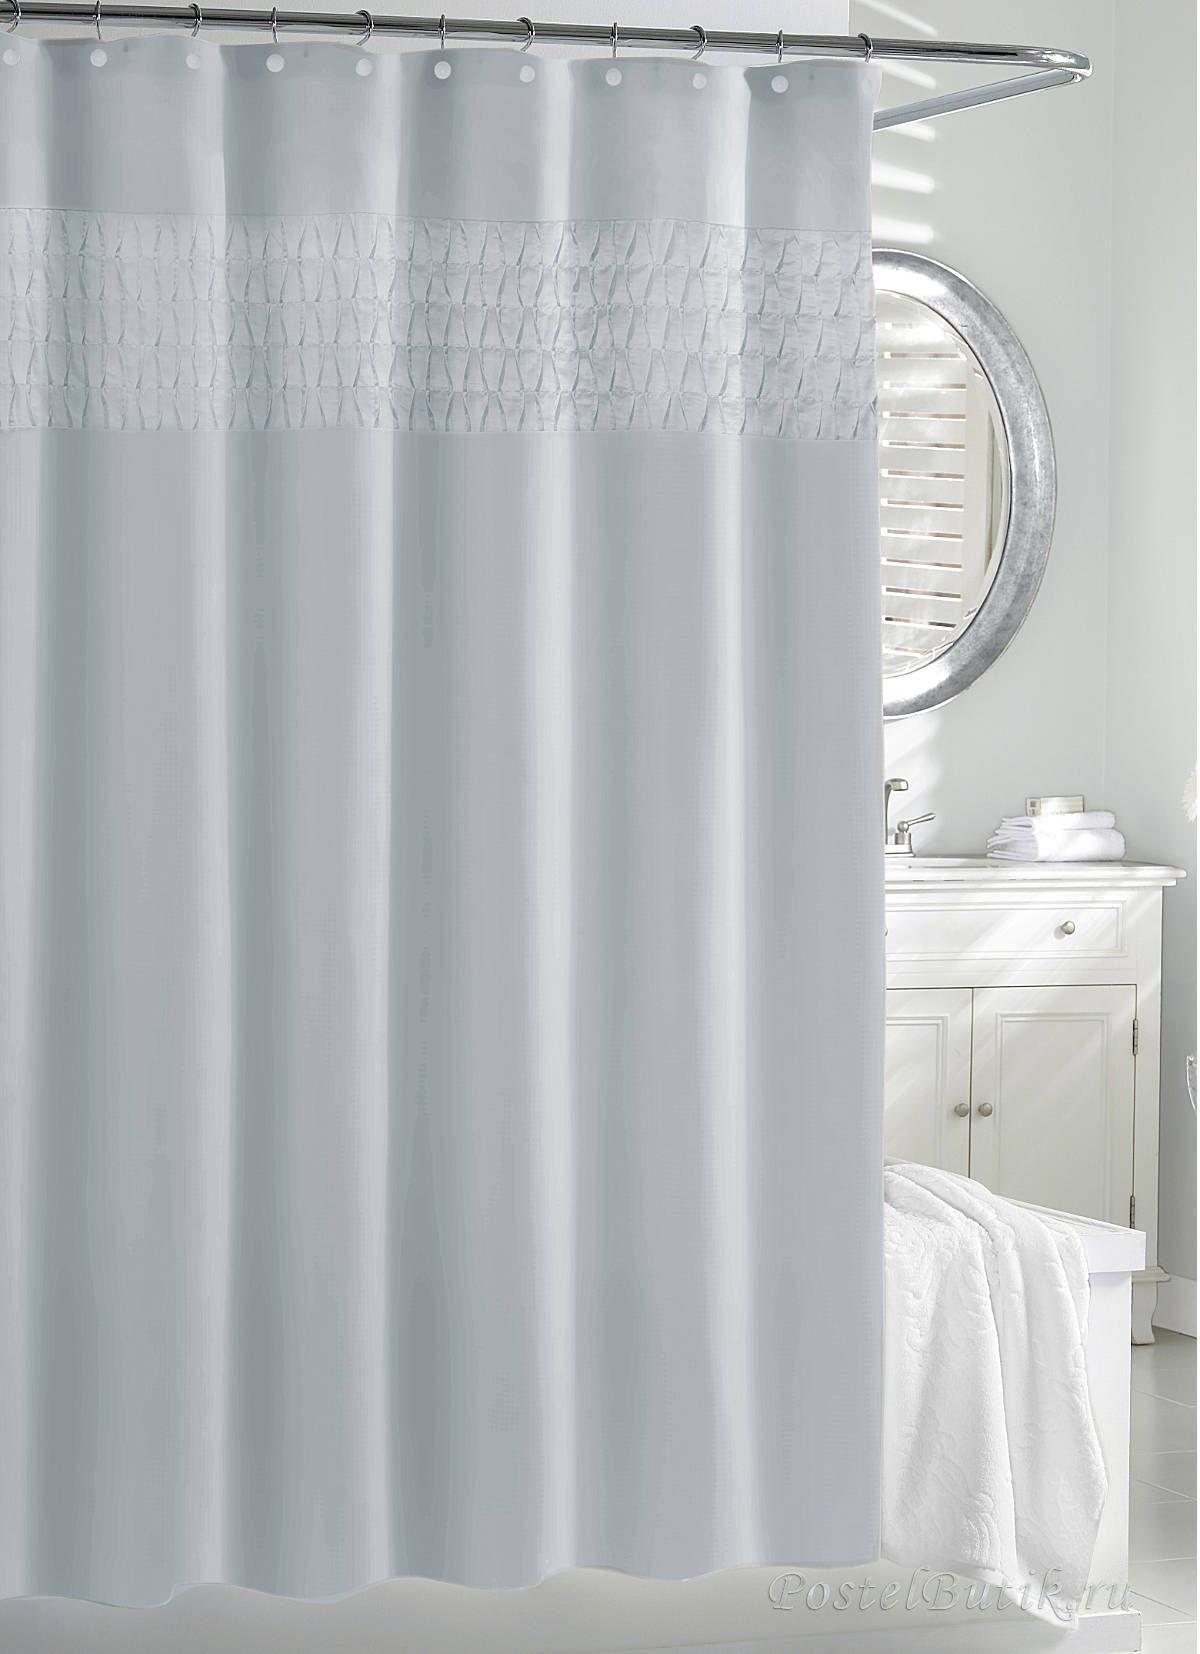 Шторки Элитная шторка для ванной Smock Pleat SPA Blue от Kassatex elitnaya-shtorka-dlya-vannoy-smock-pleat-spa-blue-ot-kassatex-portugaliya.jpeg